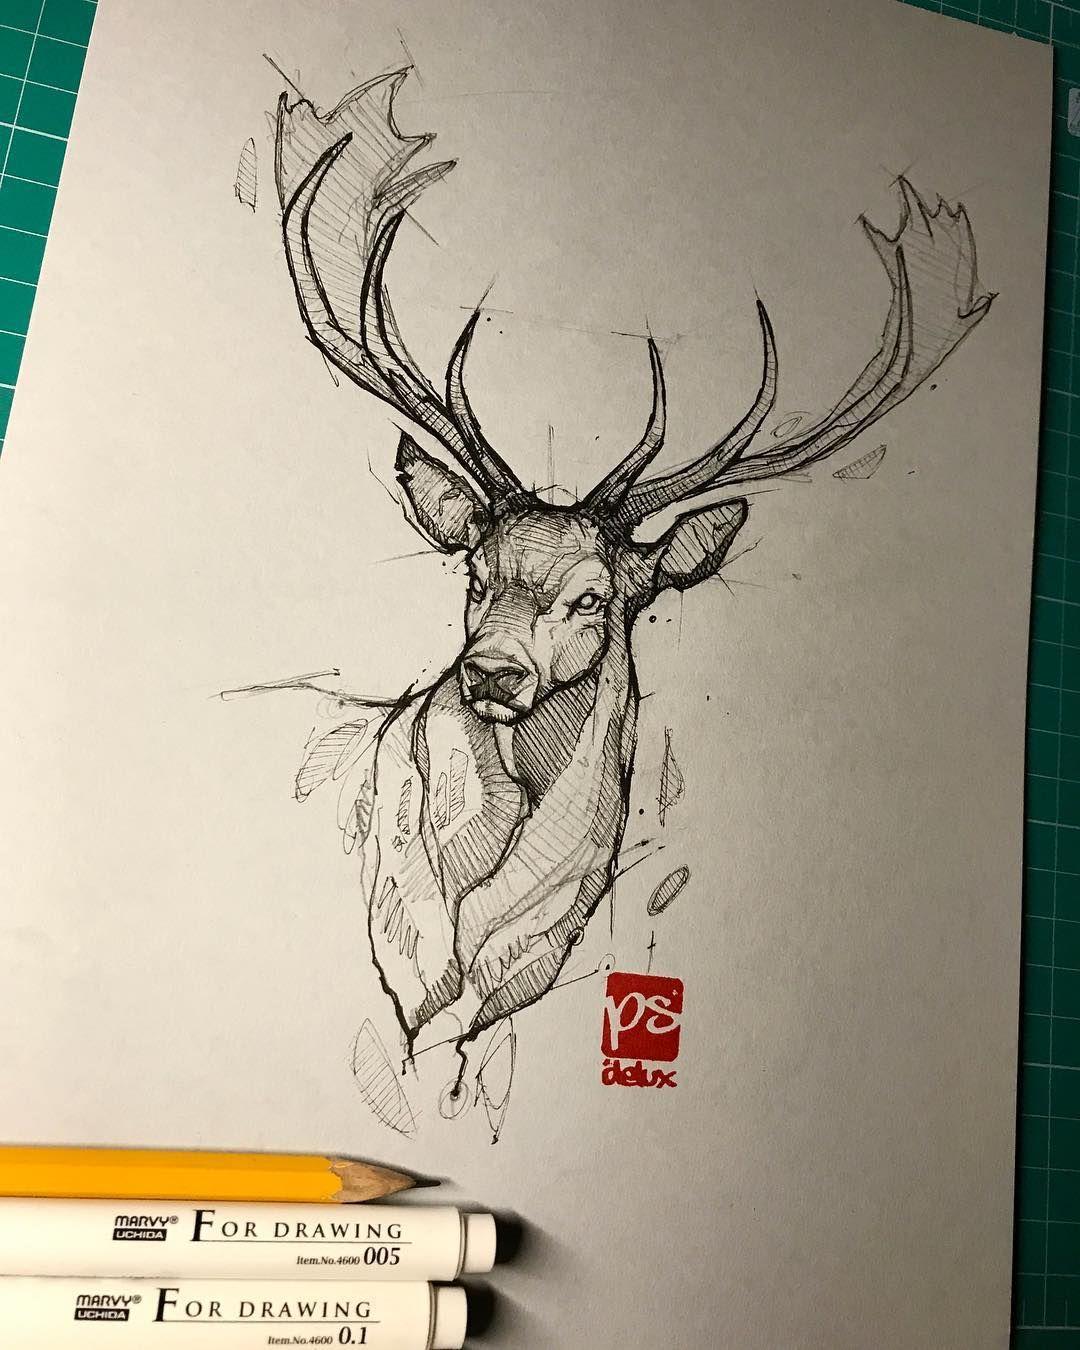 Psdelux On Instagram Casa Em 2019 Desenhos A Lápis